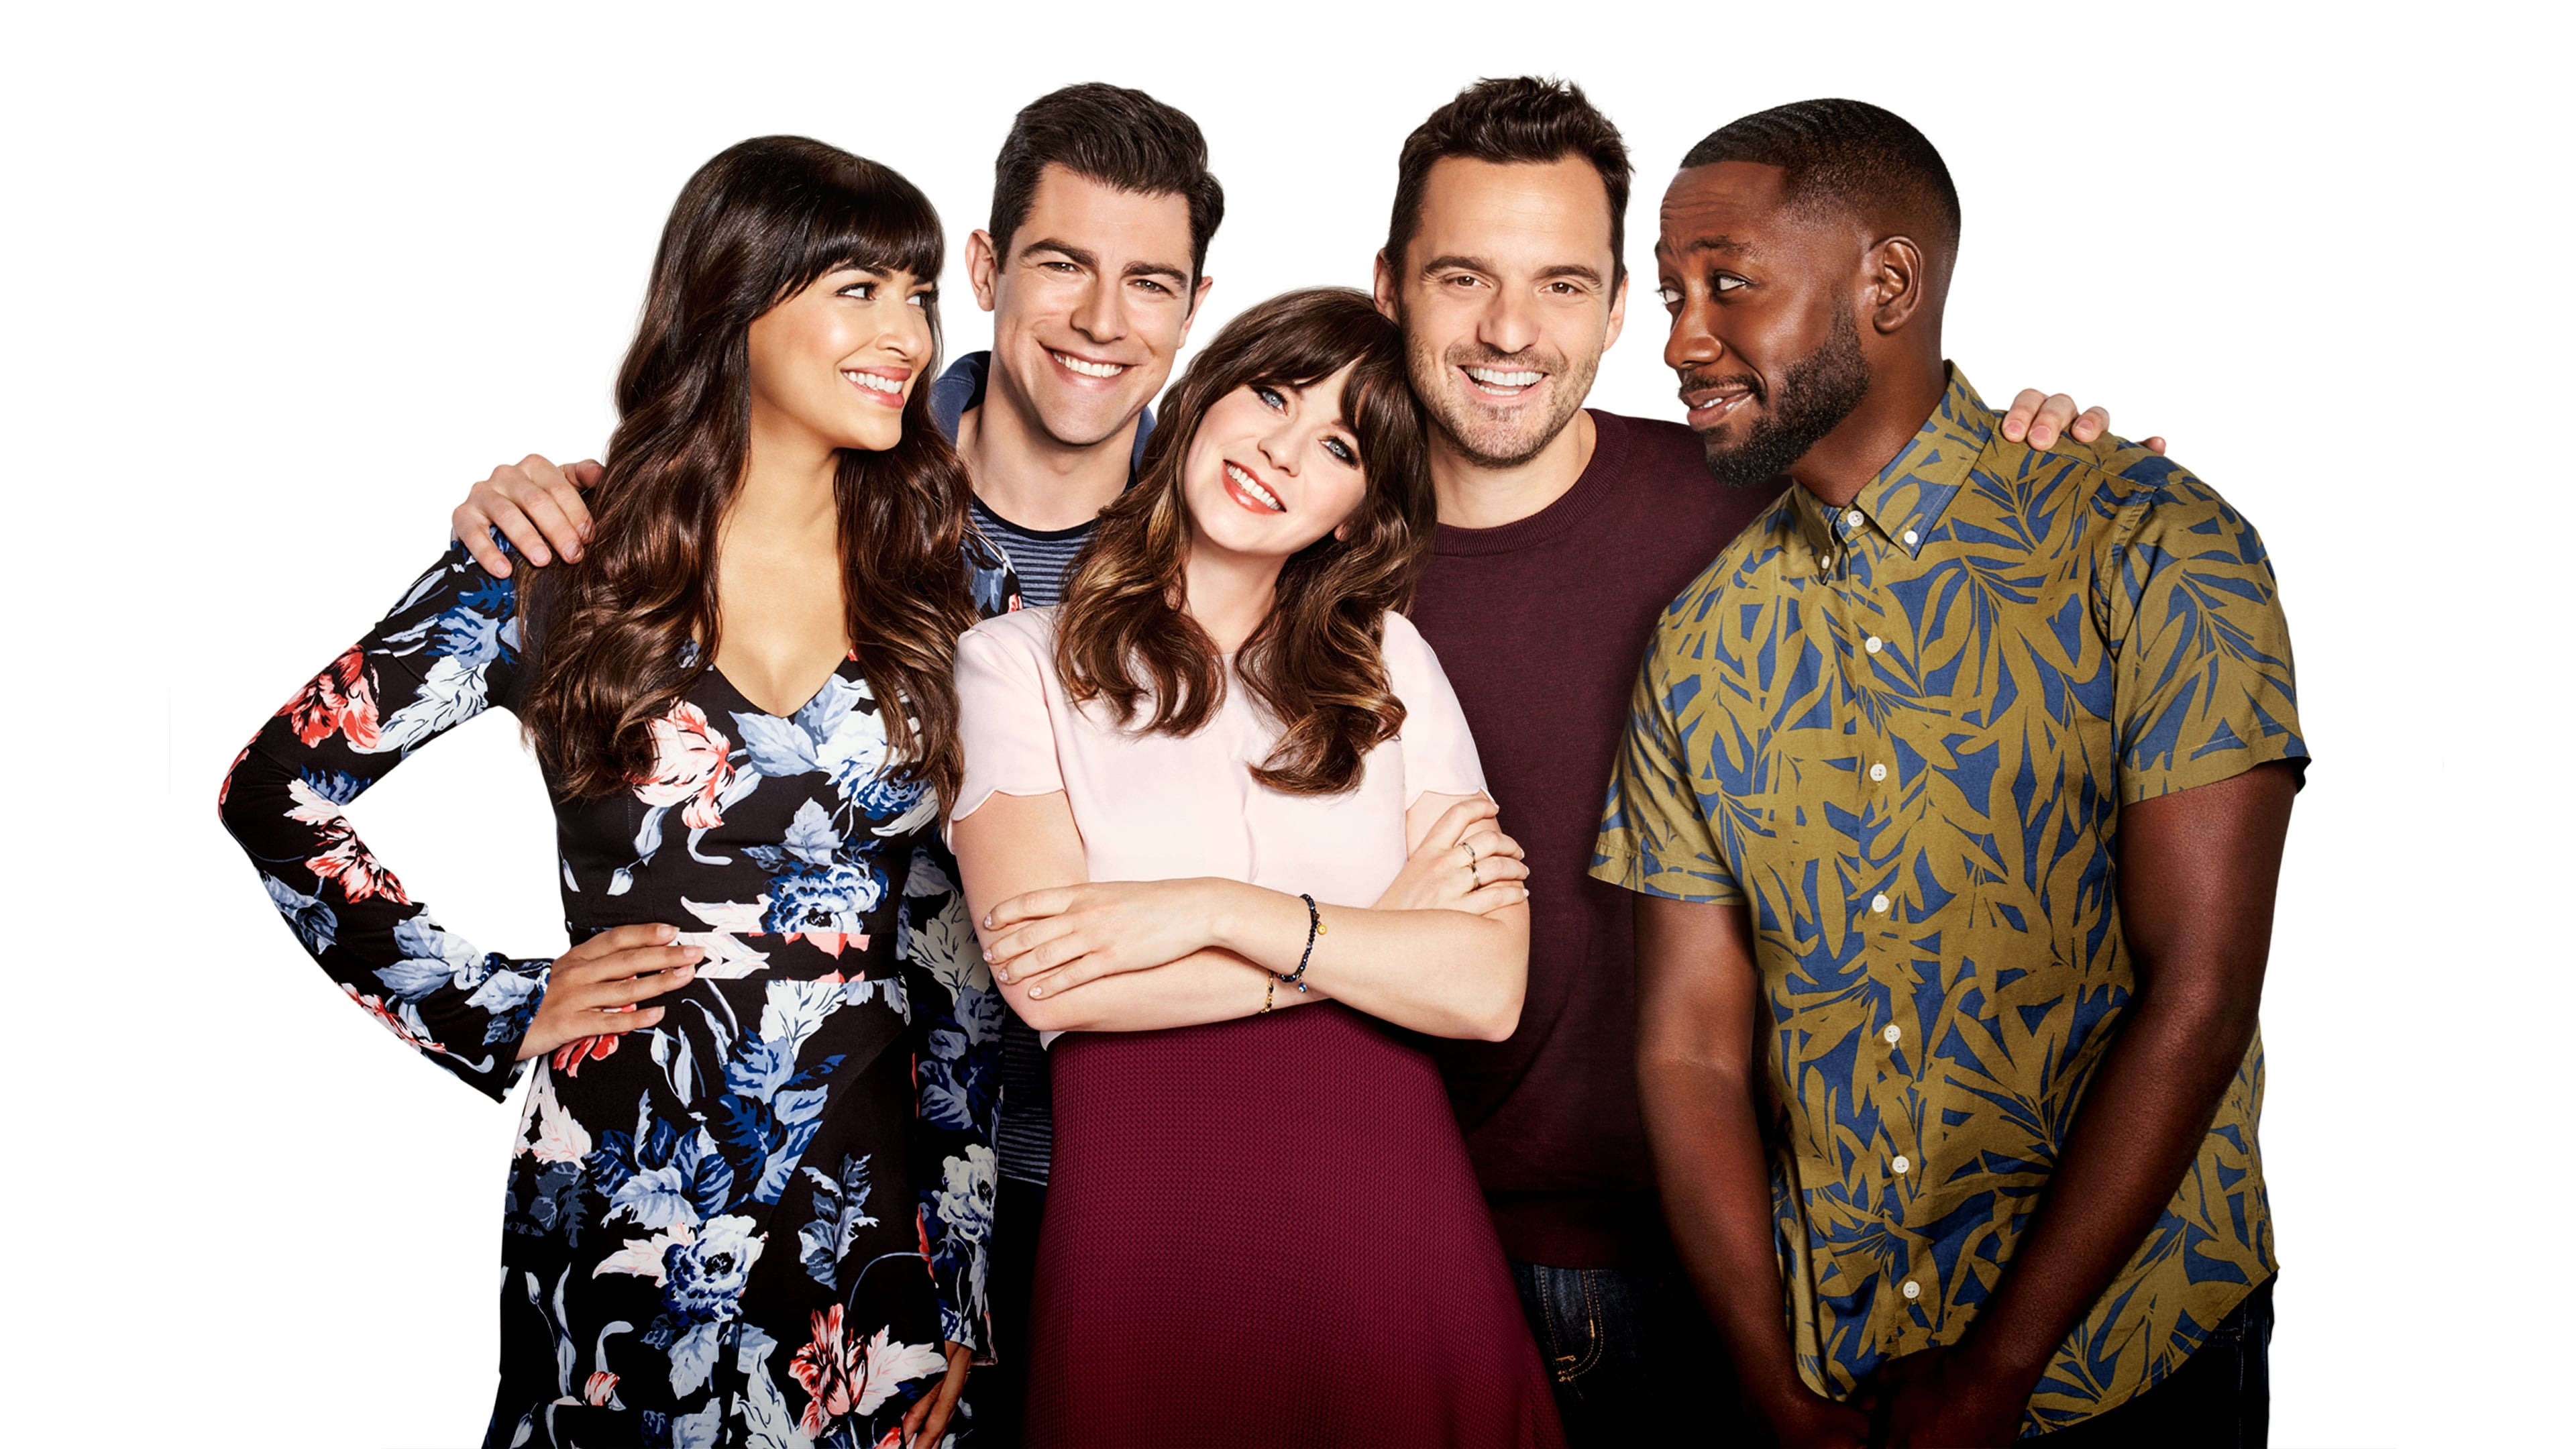 New Girl - Season 7 Episode 8